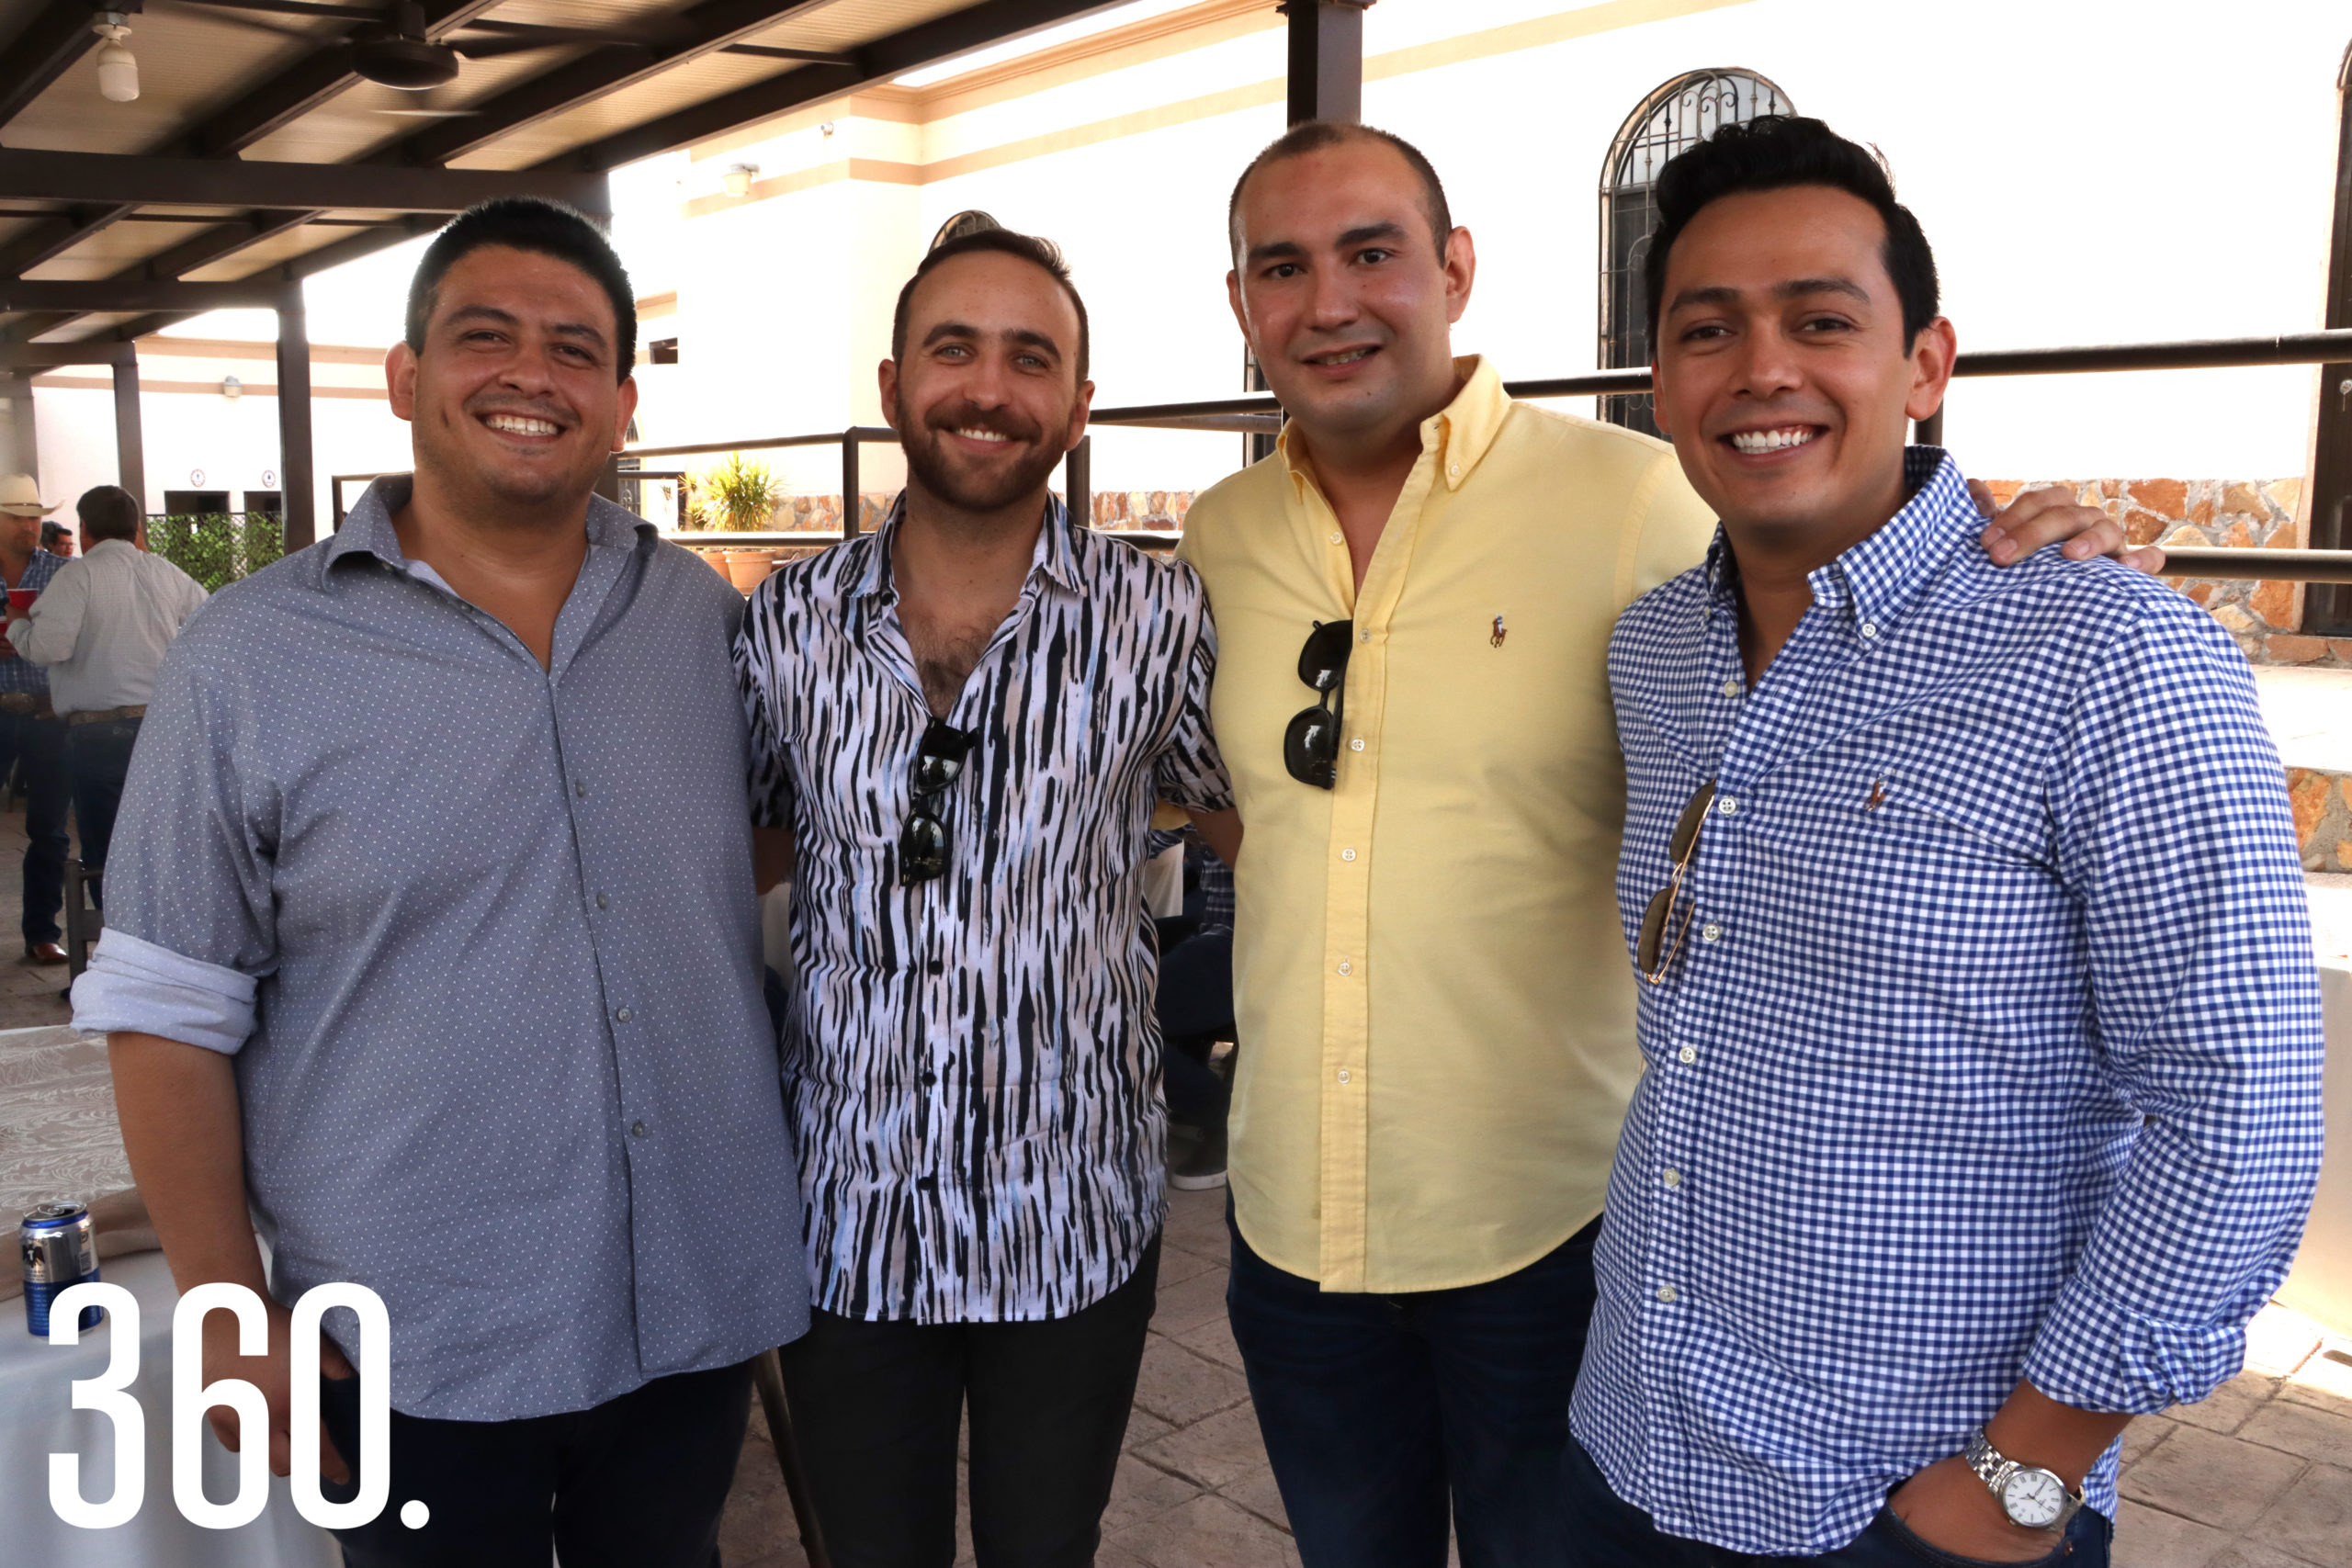 Daniel Chávez, Memo Dávila, Joel Cárdenas y Diego Chávez.